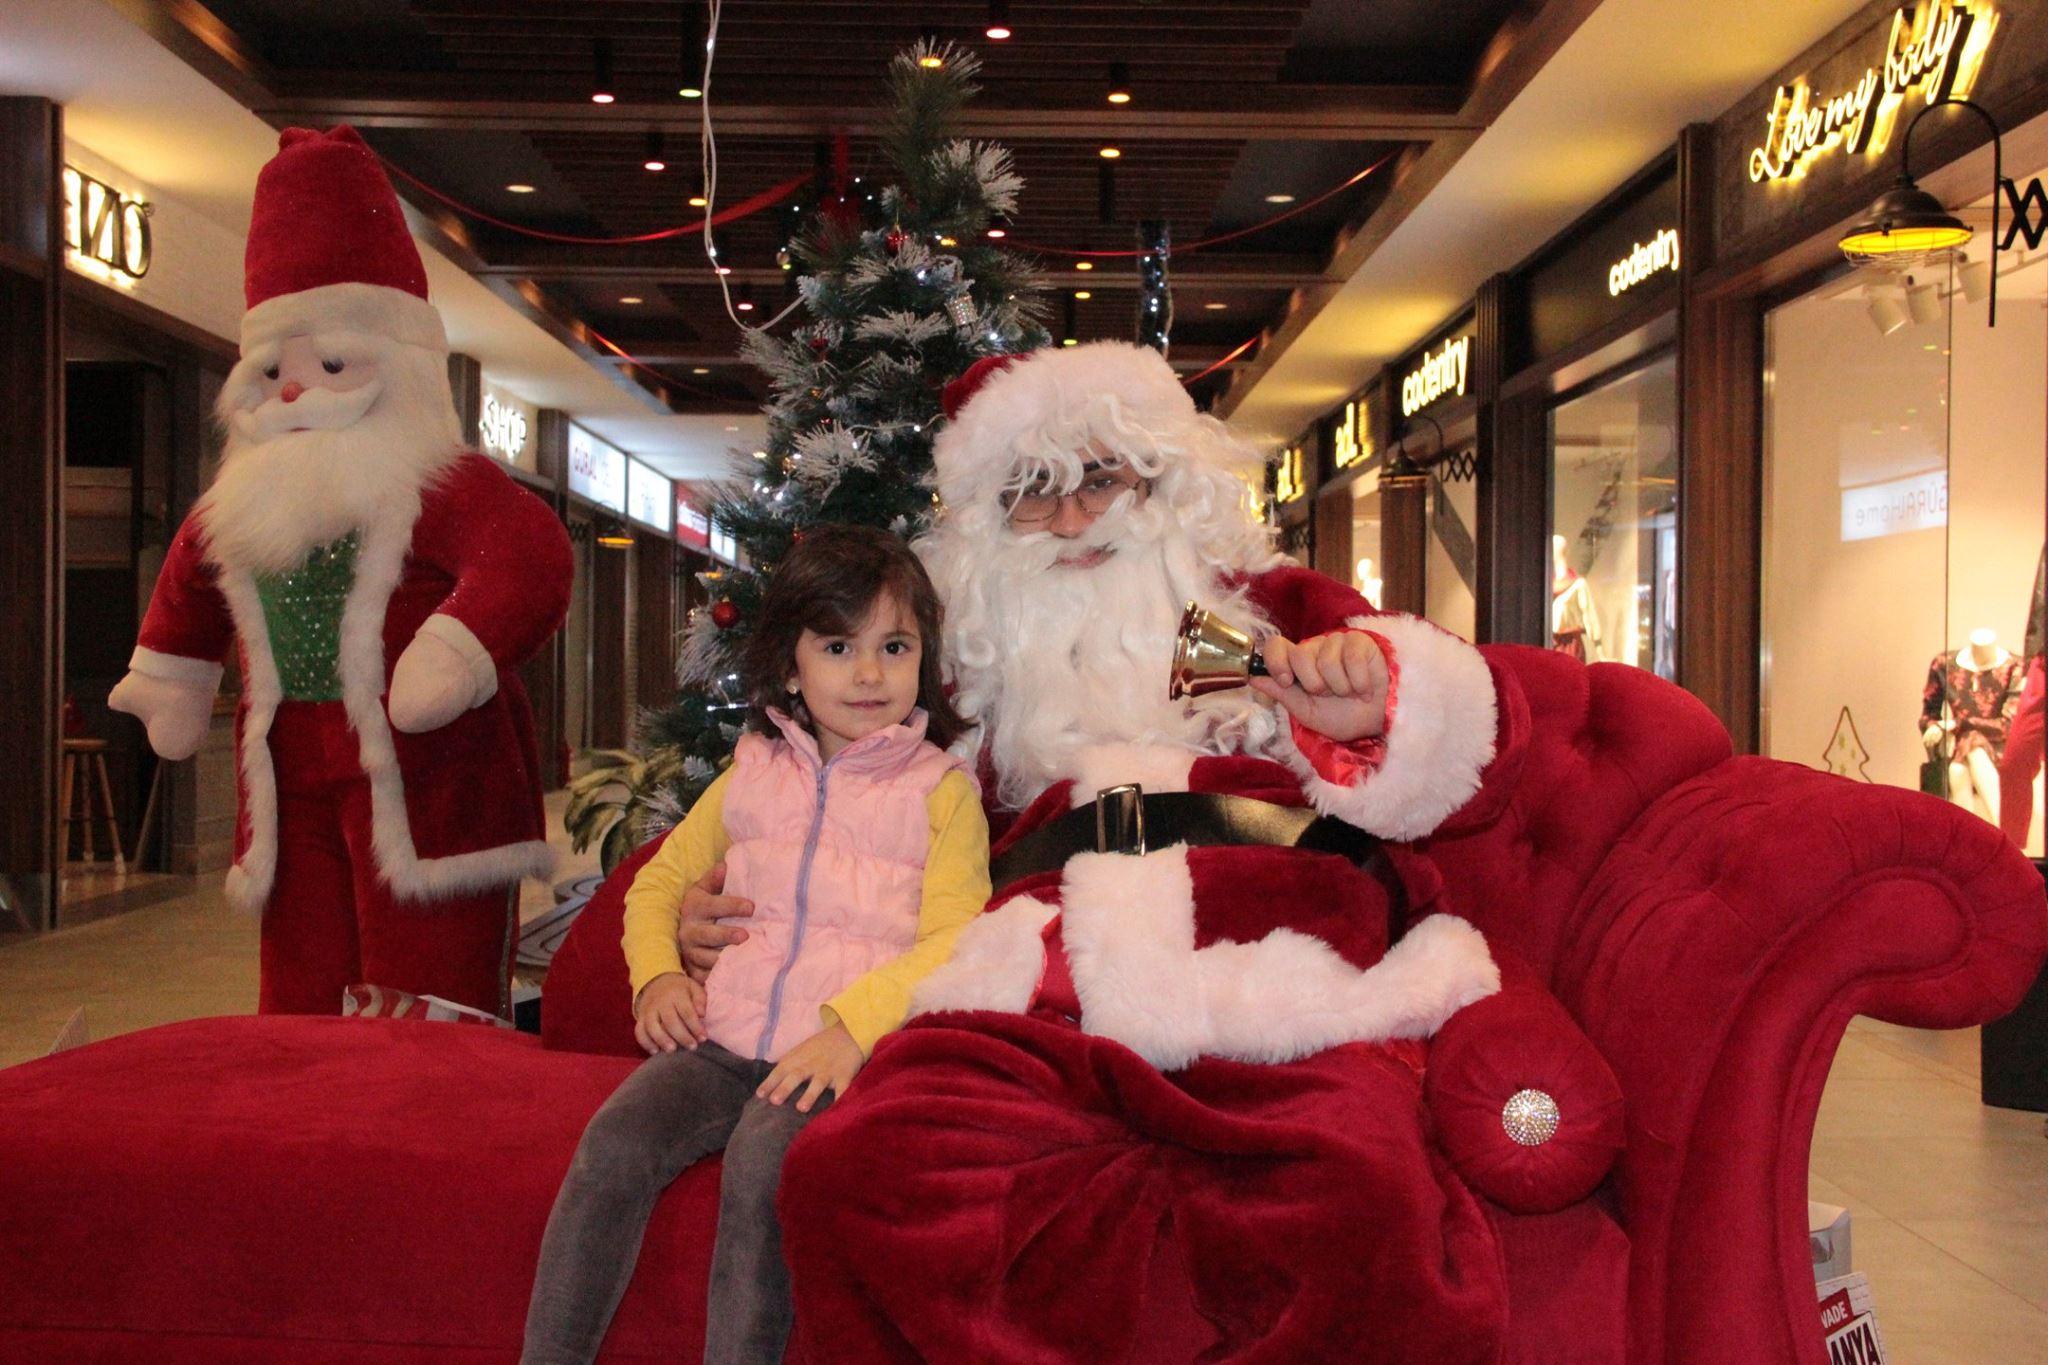 Загадываем желание Санта-Клаусу